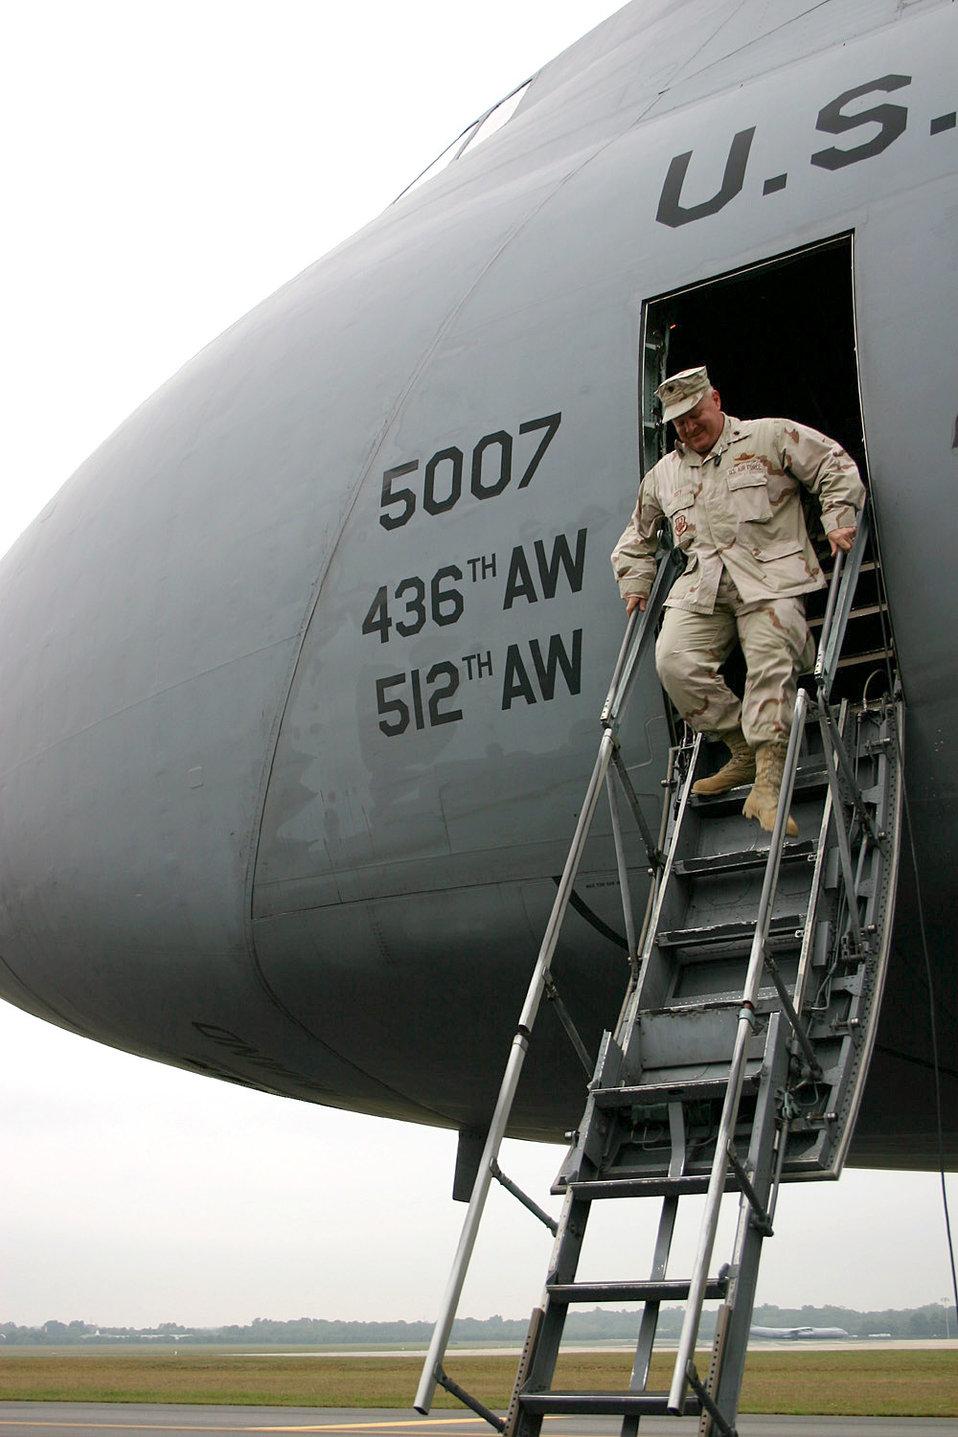 Lt. Col. serves on three AEF rotations